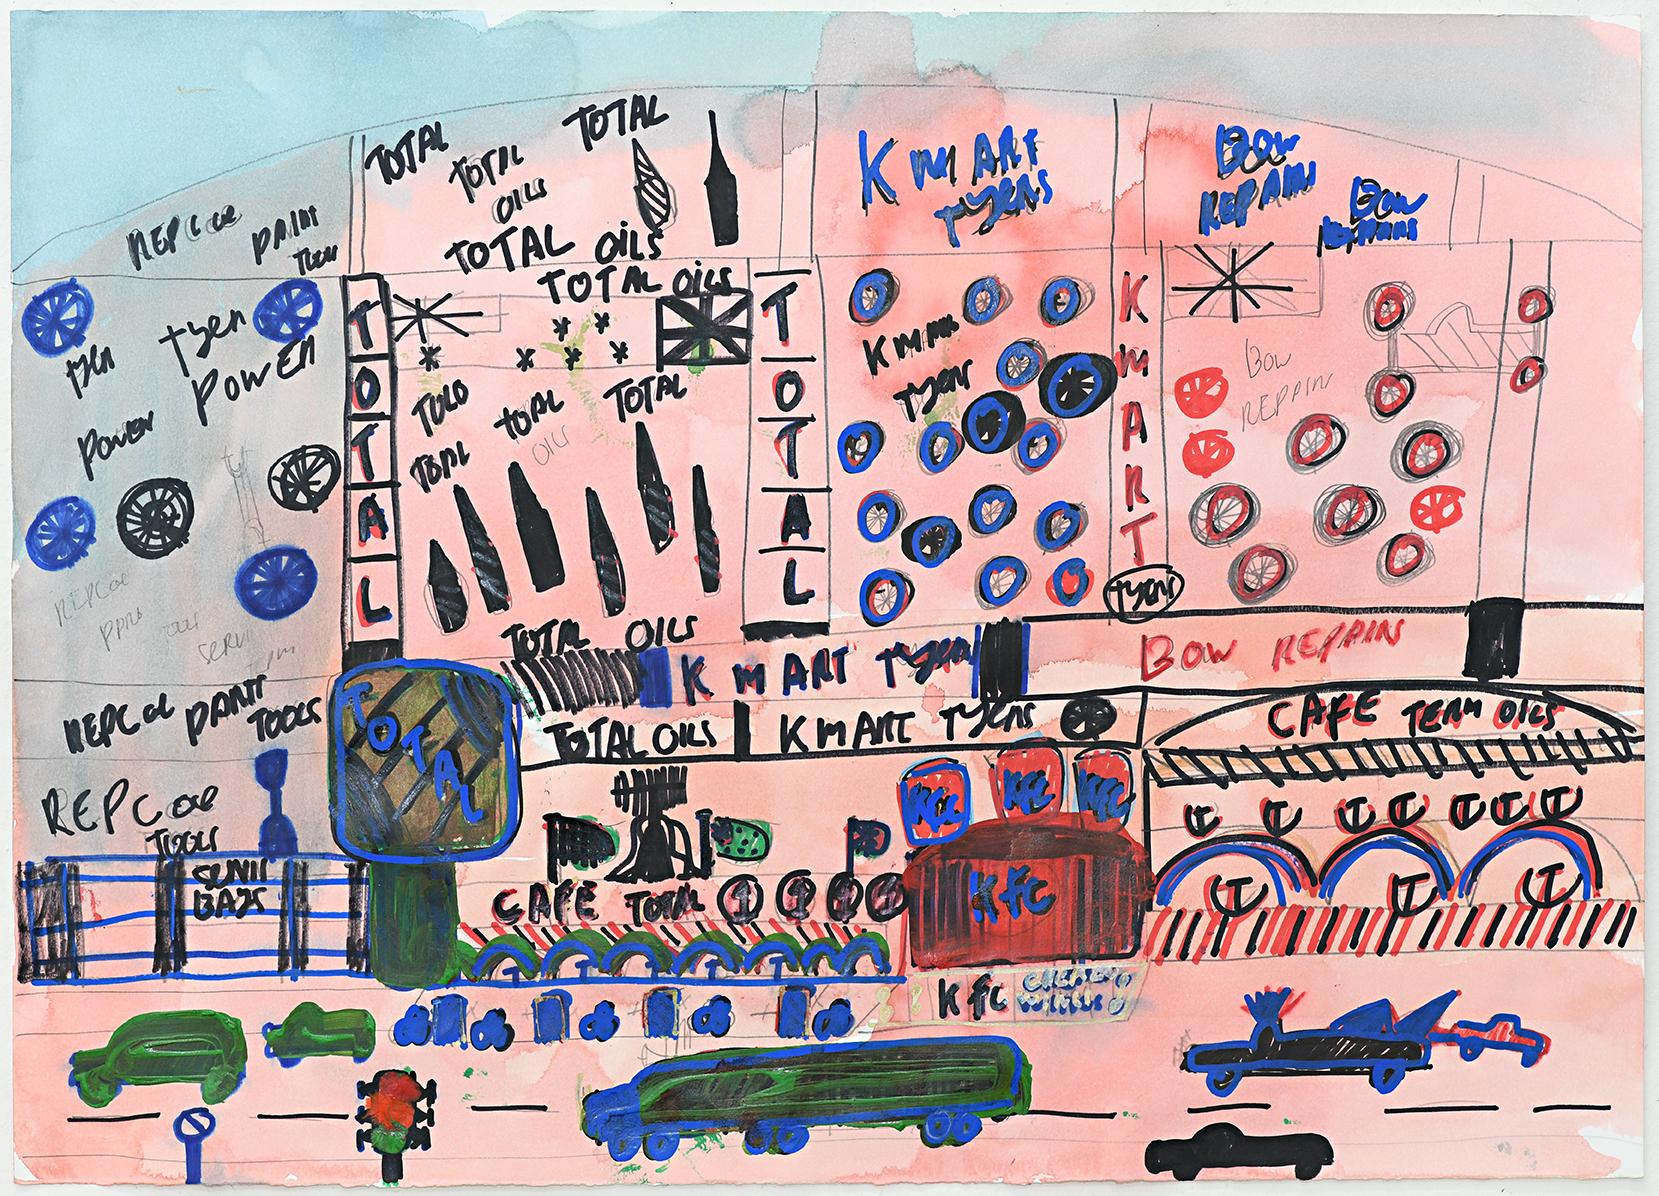 Frenetic workings of the western world: Steven Perrette Solo @ Arts Project Australia